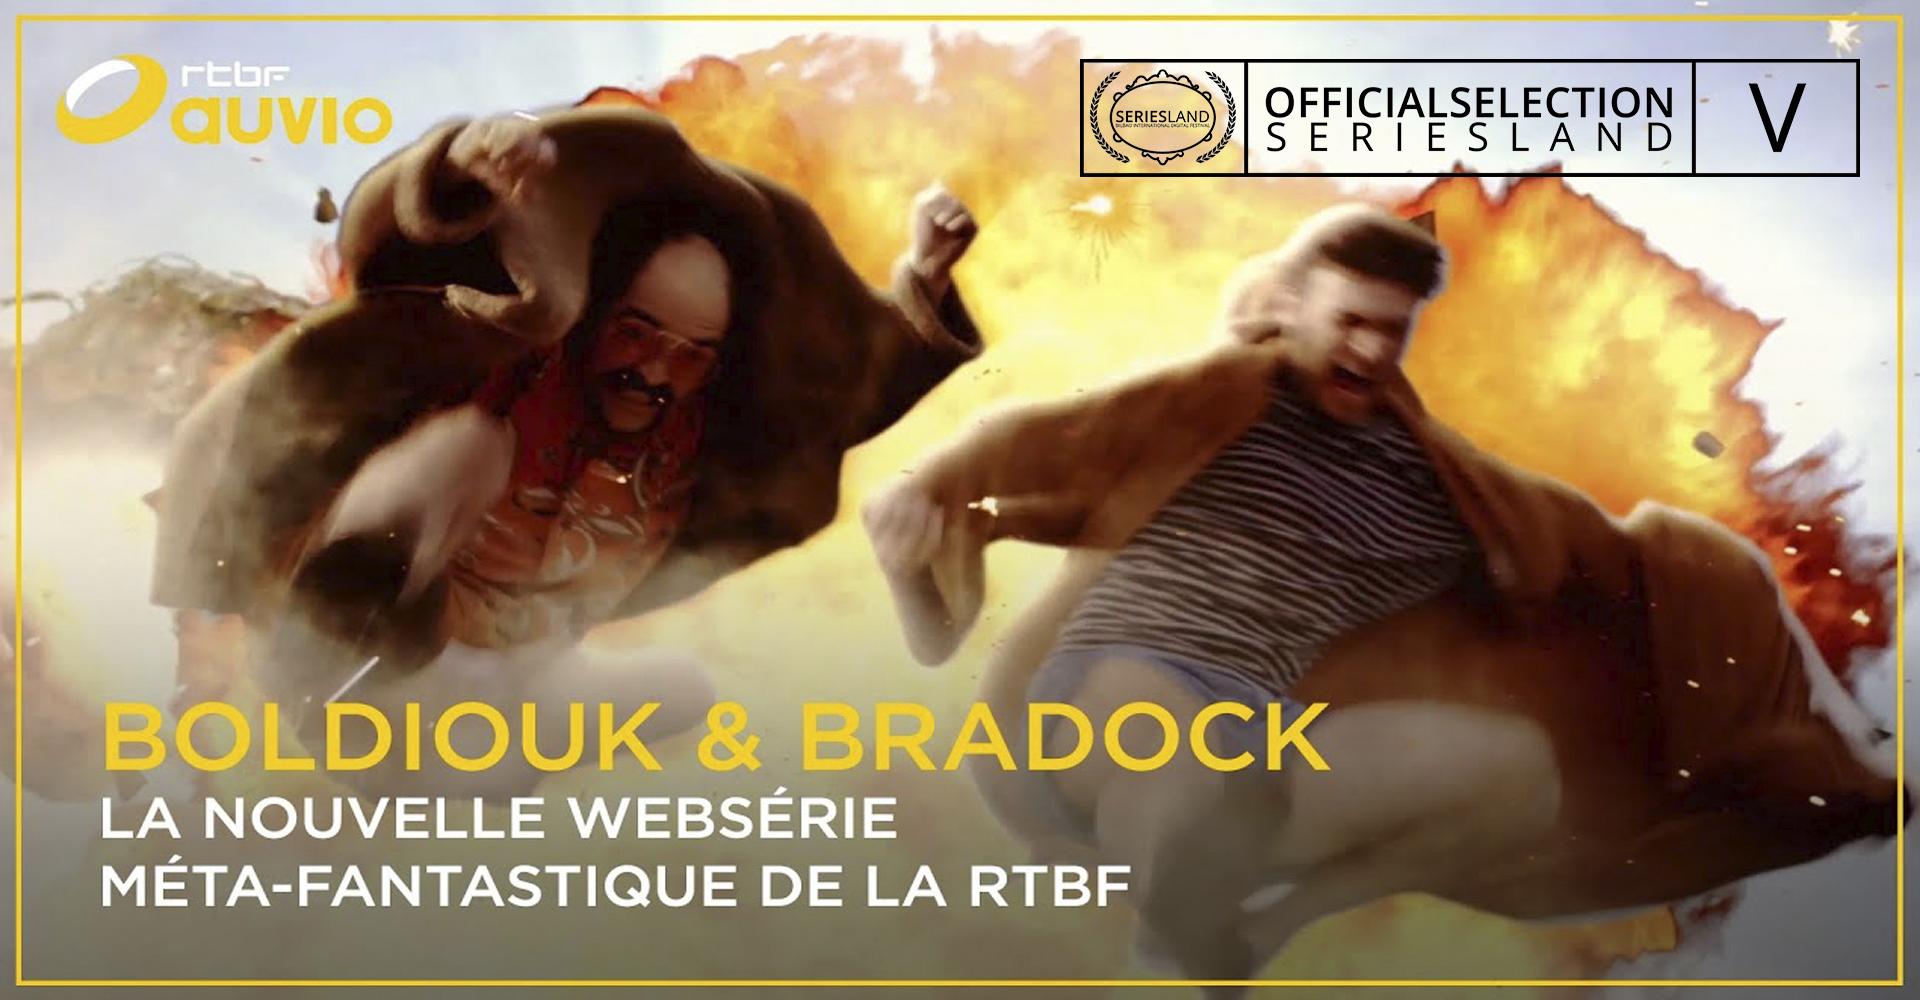 Boldiouk & Bradock en sélection officielle du Bilbao Seriesland Festival 2019, Espagne